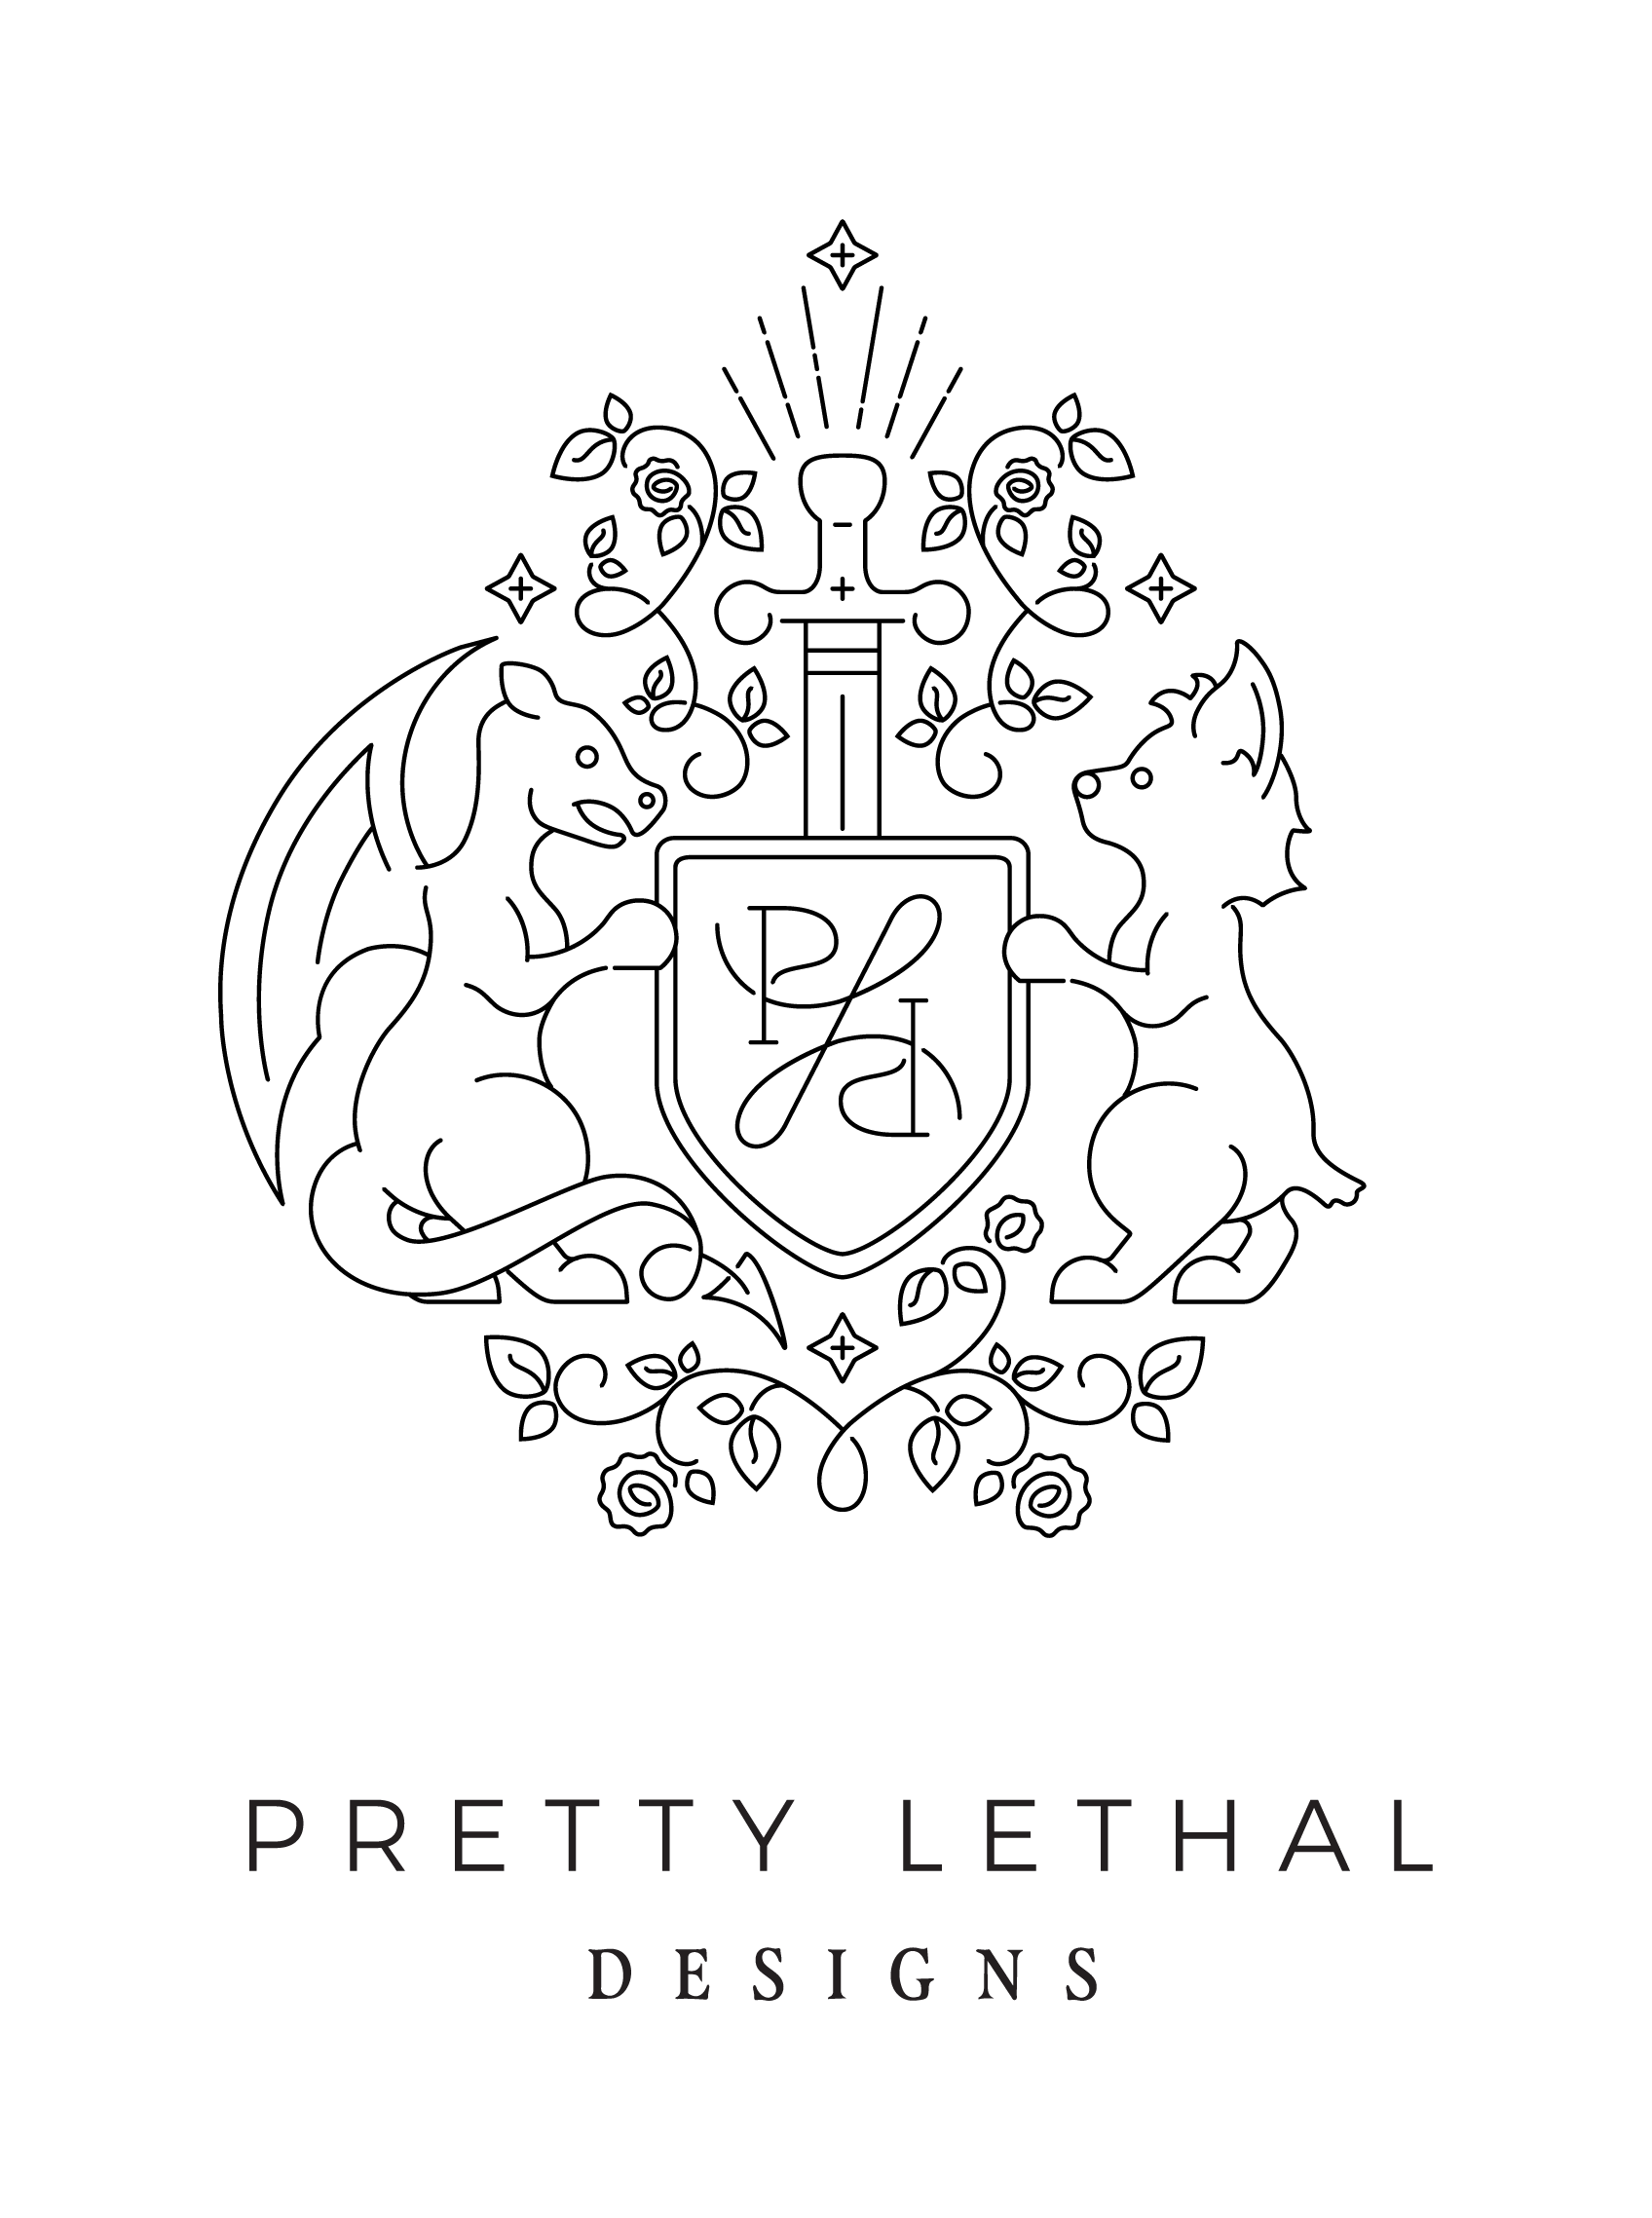 PrettyLethalDesigns_FullLogo - Samantha Everett.png